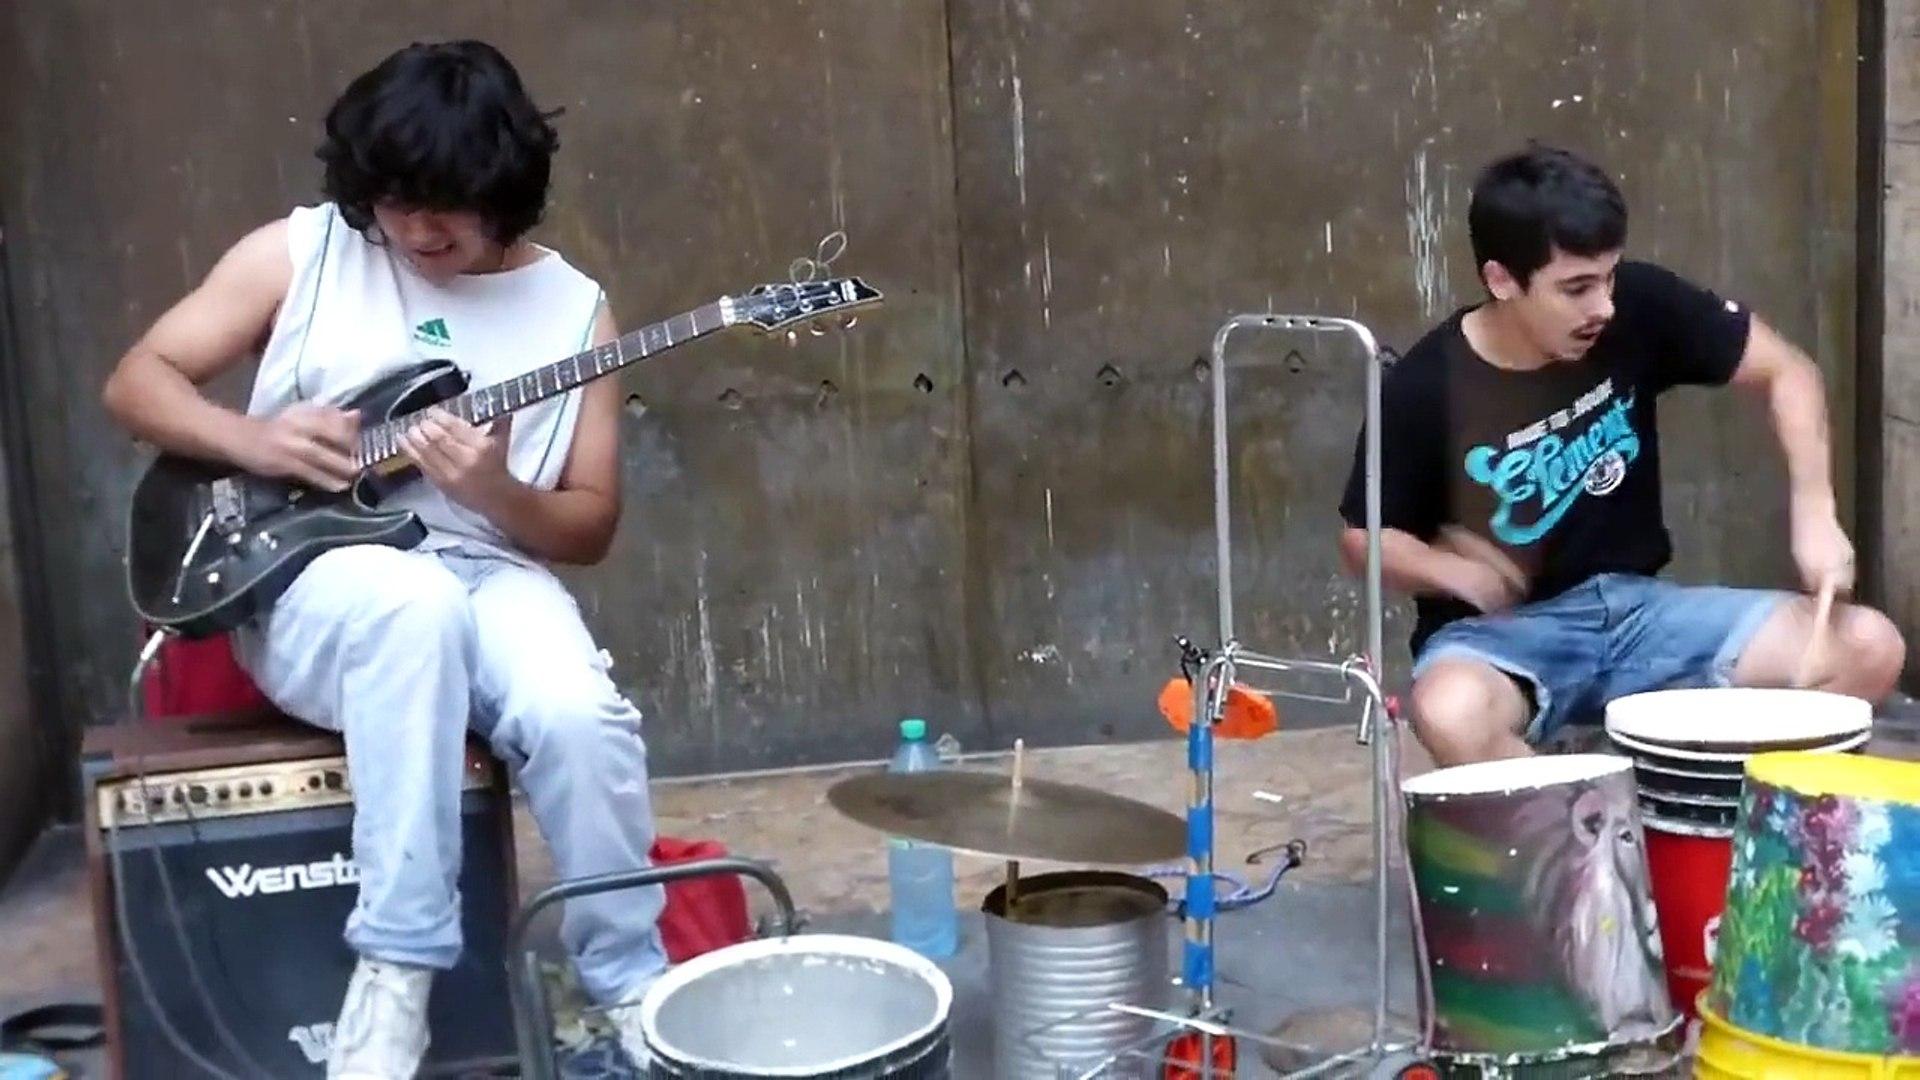 Street musicians cover Dire strait : Stunning performance